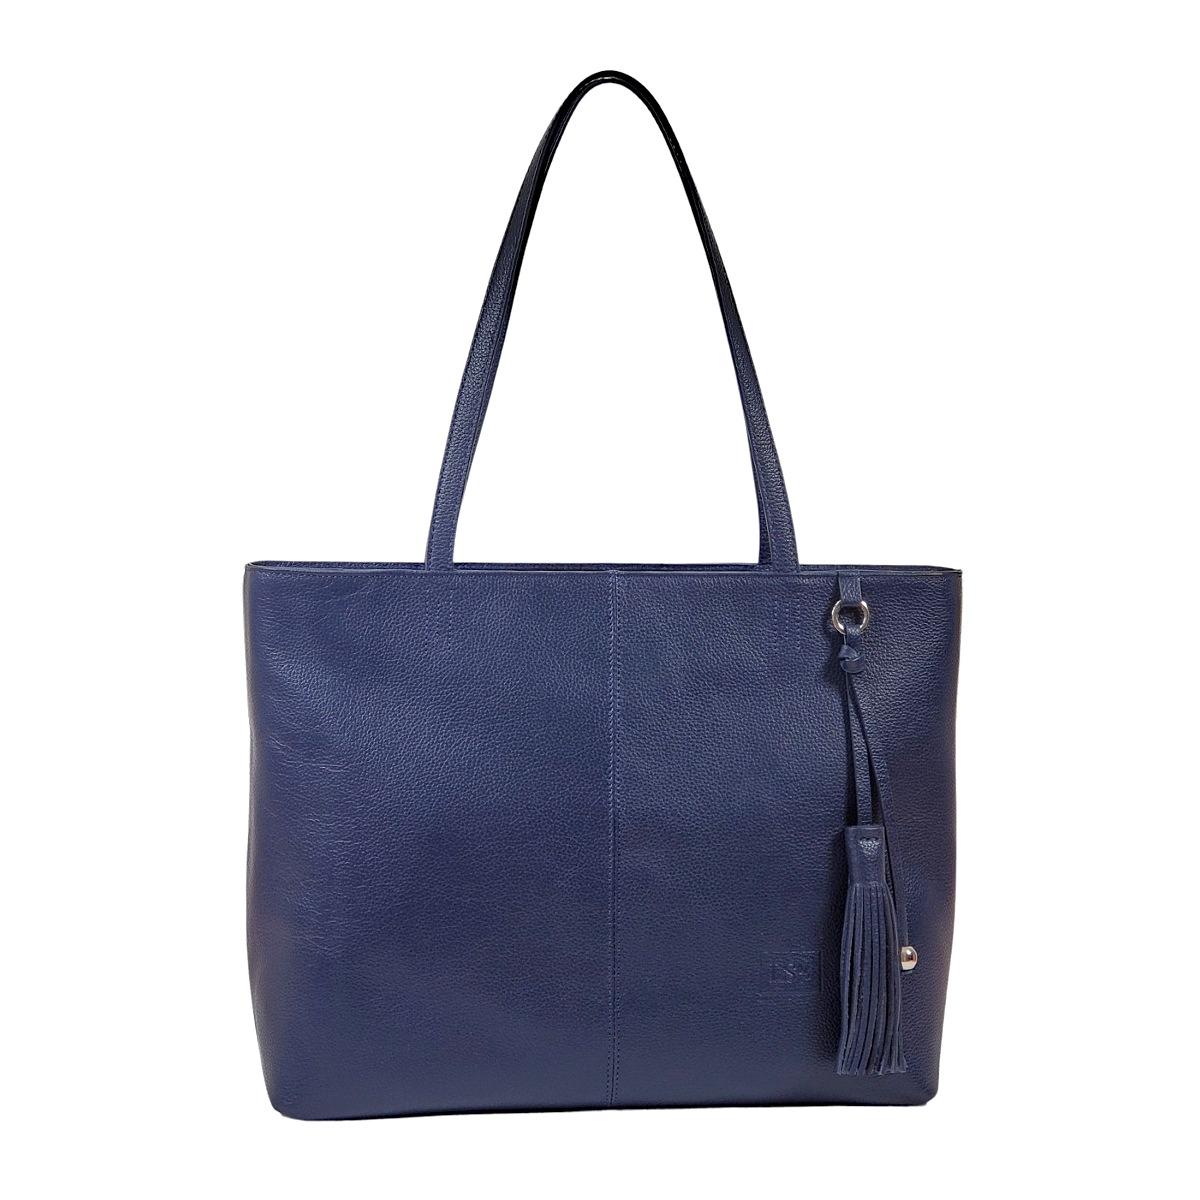 Alyssa Blue Leather Handbag